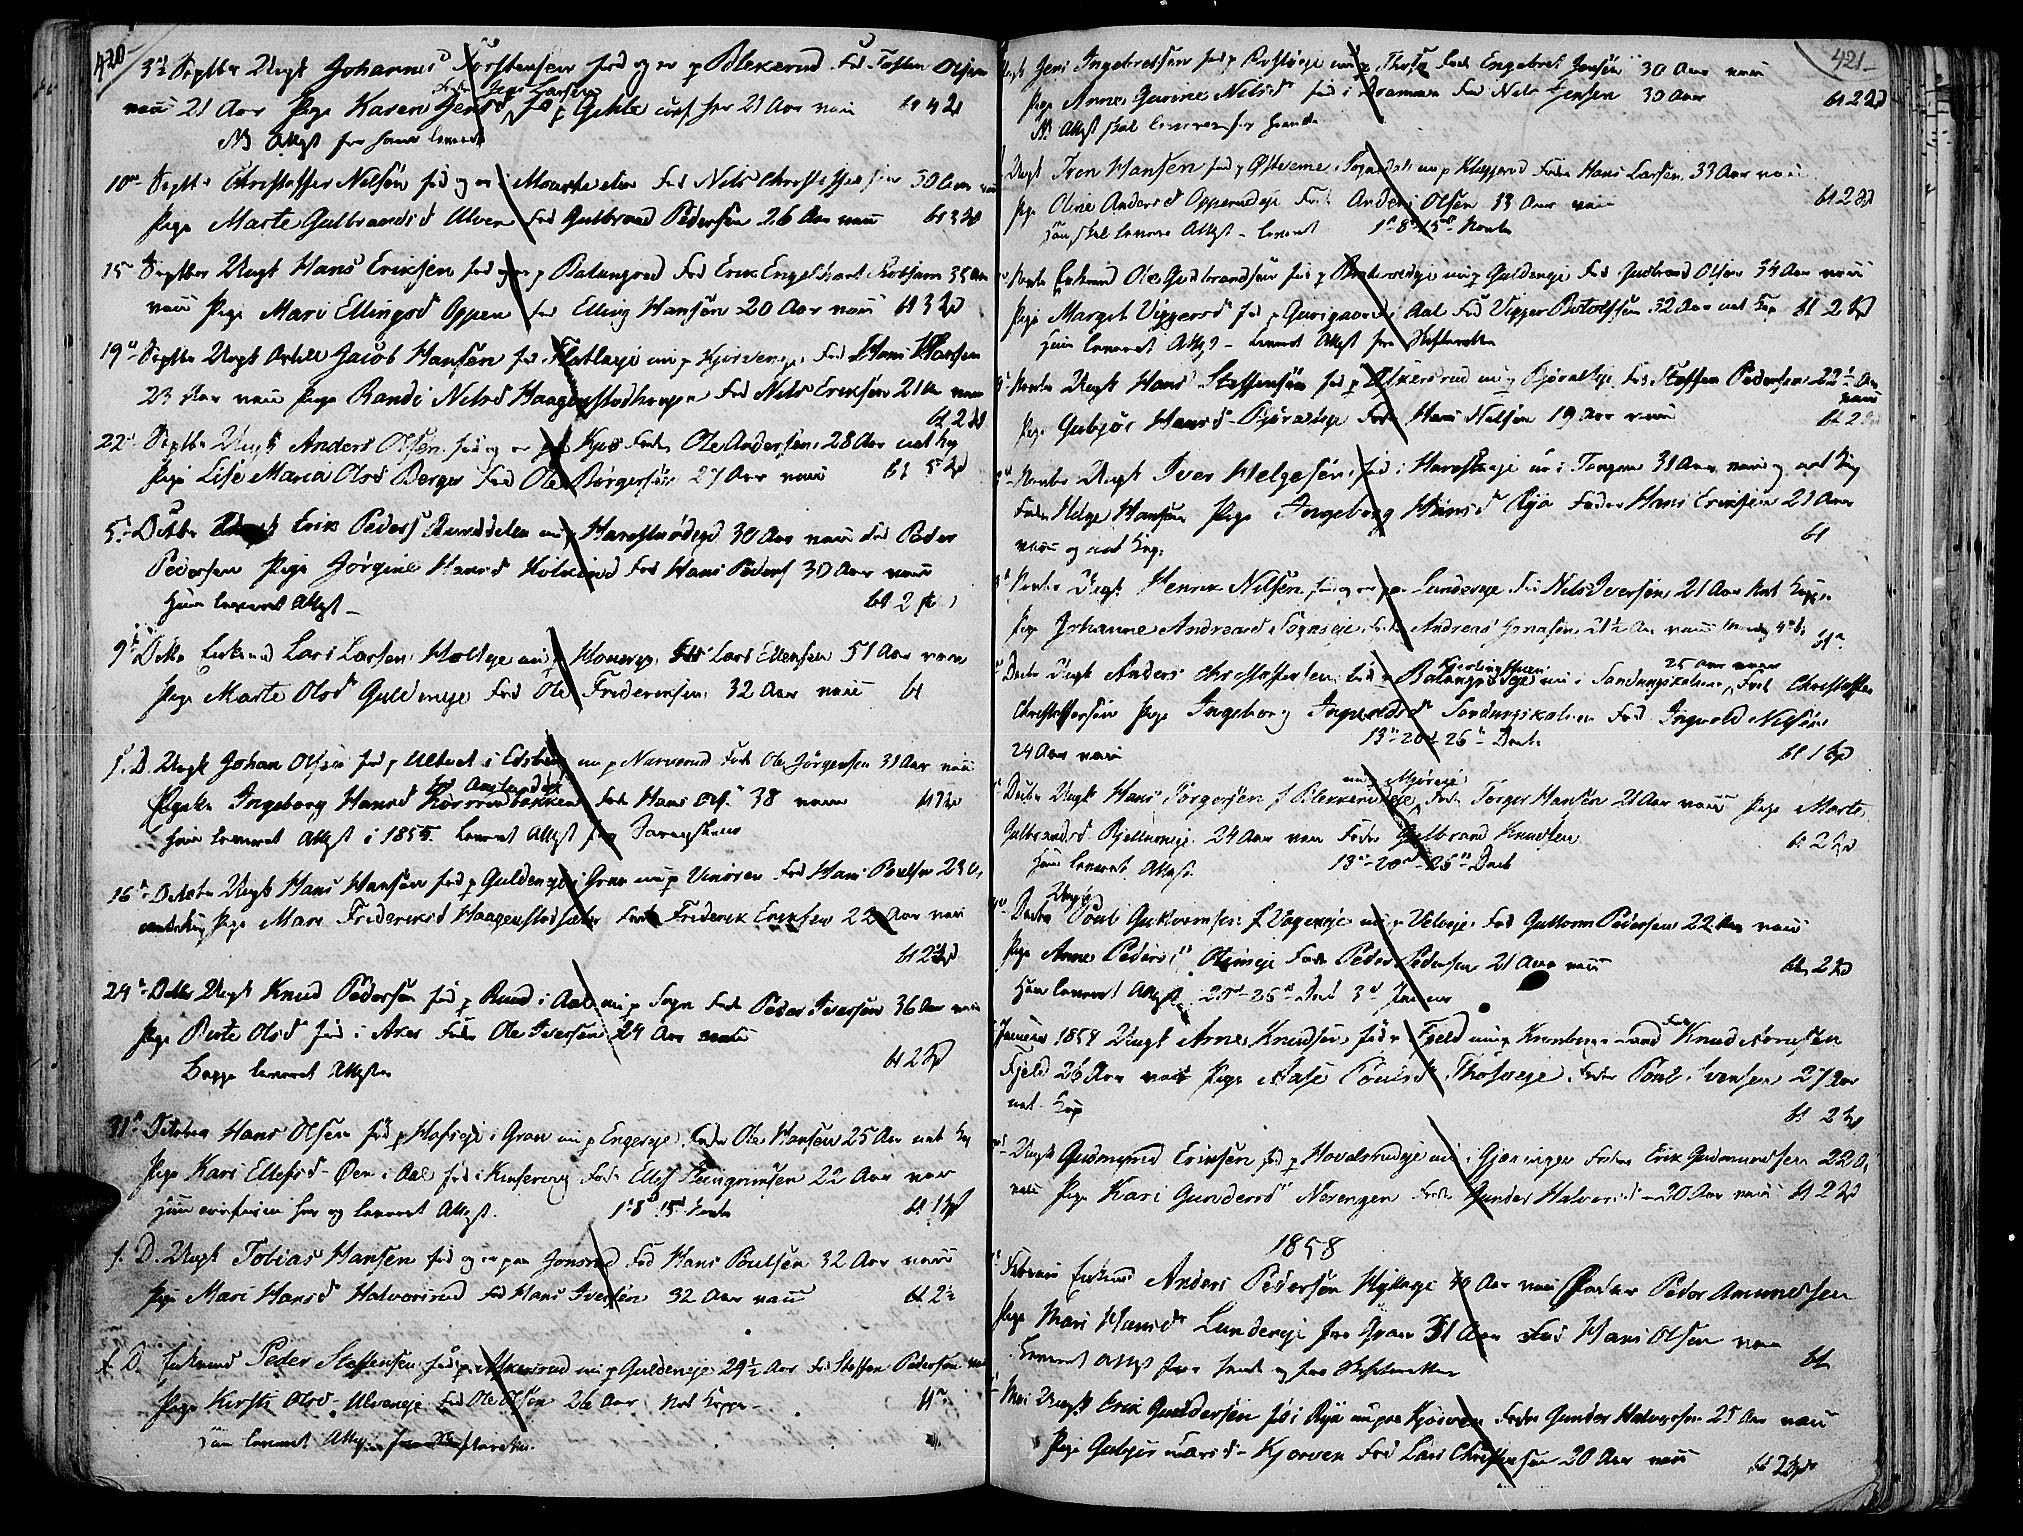 SAH, Jevnaker prestekontor, Ministerialbok nr. 4, 1800-1861, s. 420-421